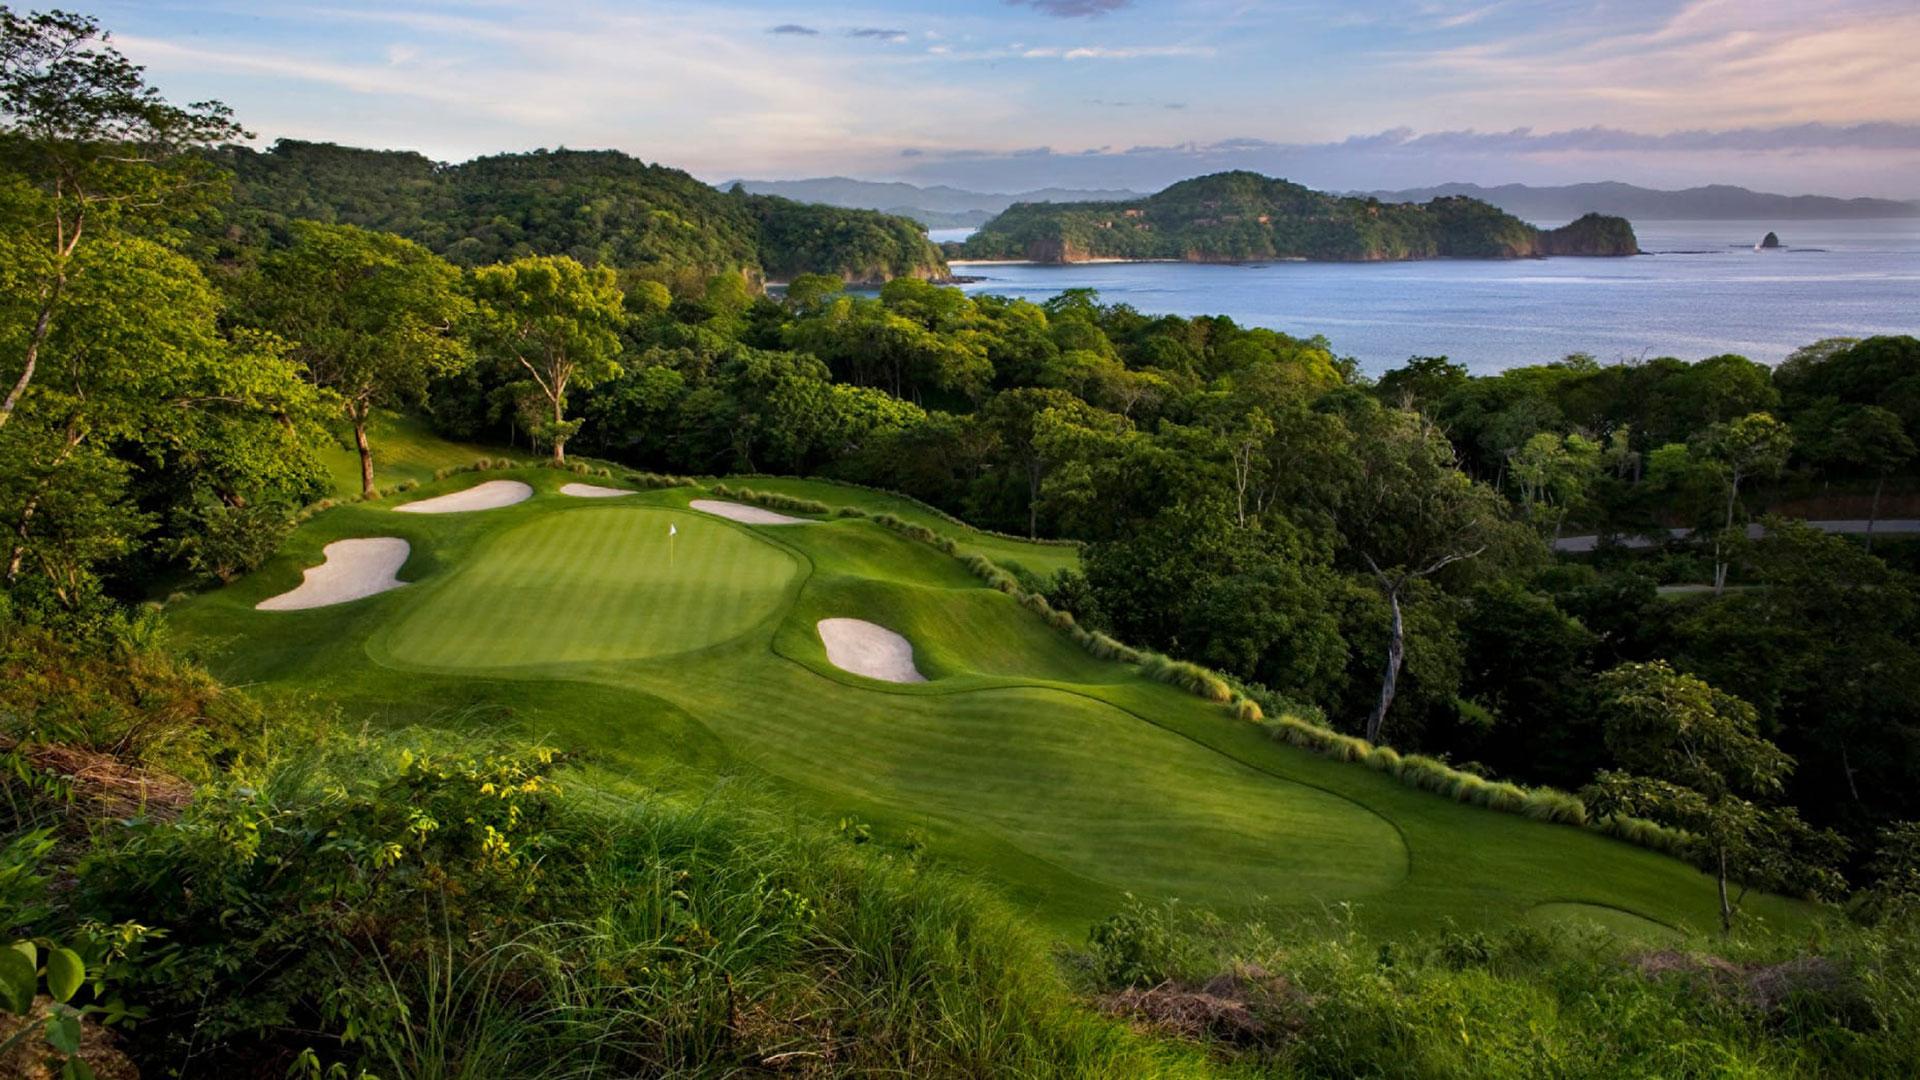 Golfplatz. Luxusreise